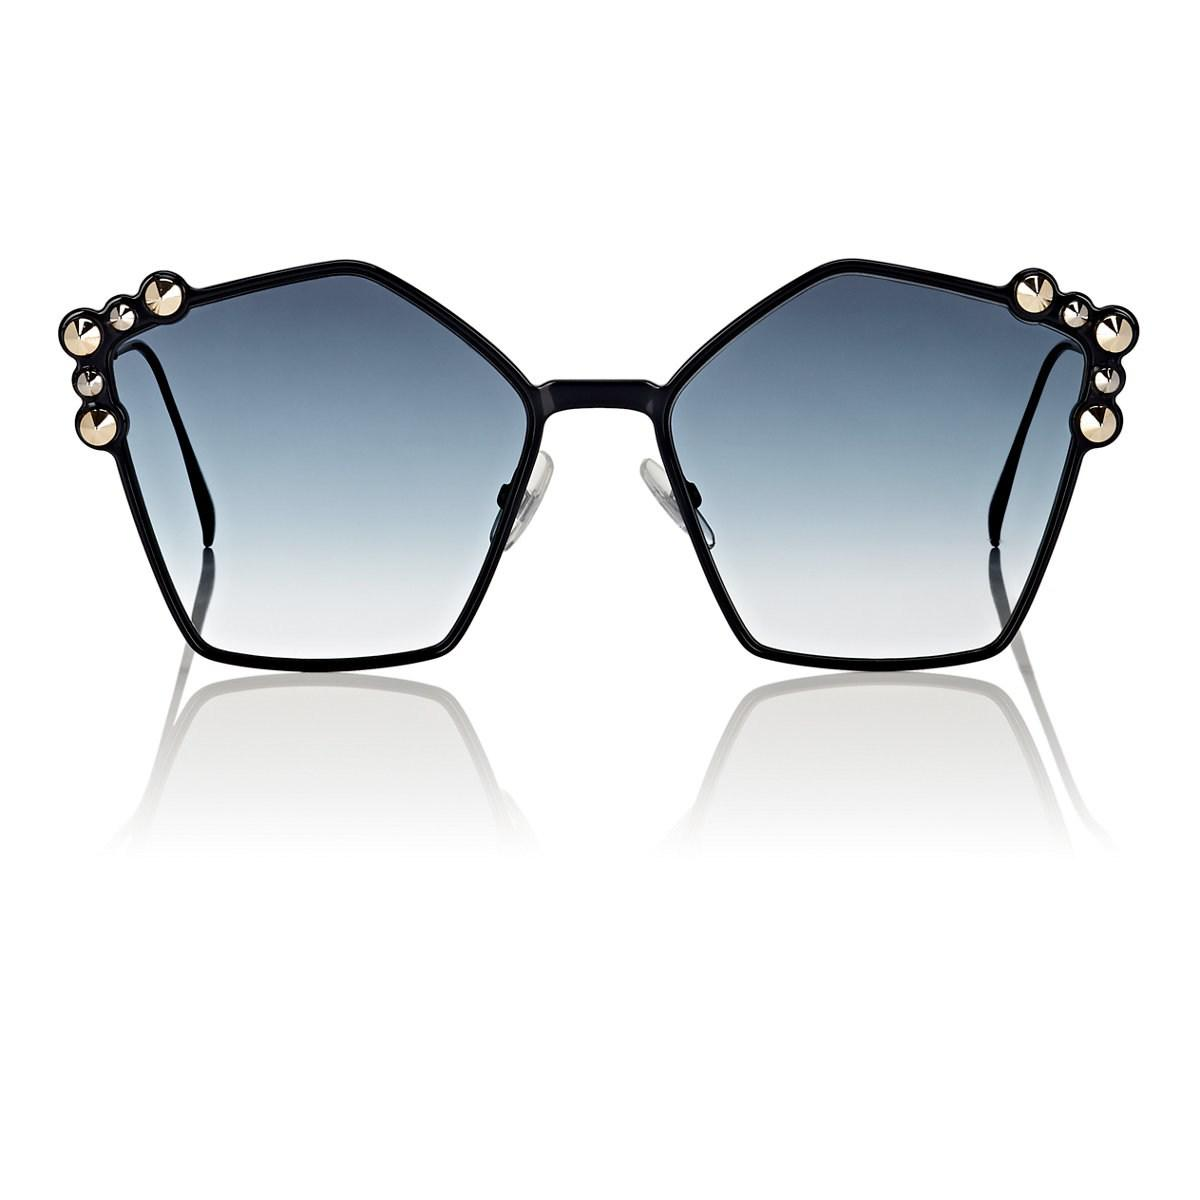 310a3e26b23eb Lyst - Fendi Ff0261 s Sunglasses in Blue